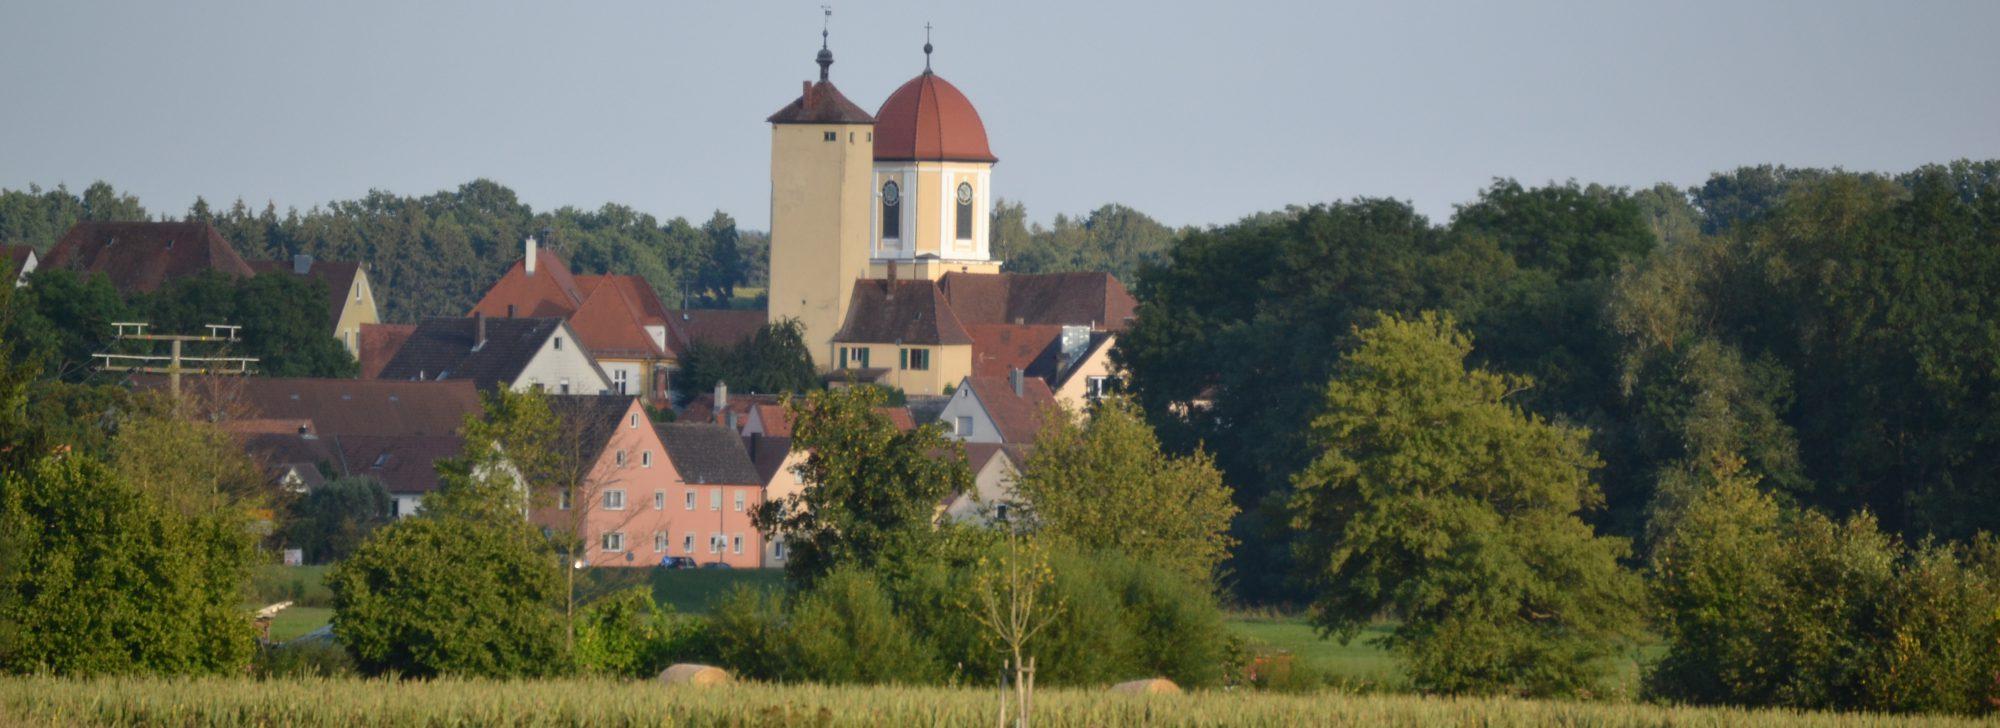 Windsbacher Bürger-für-Bürger e.V.